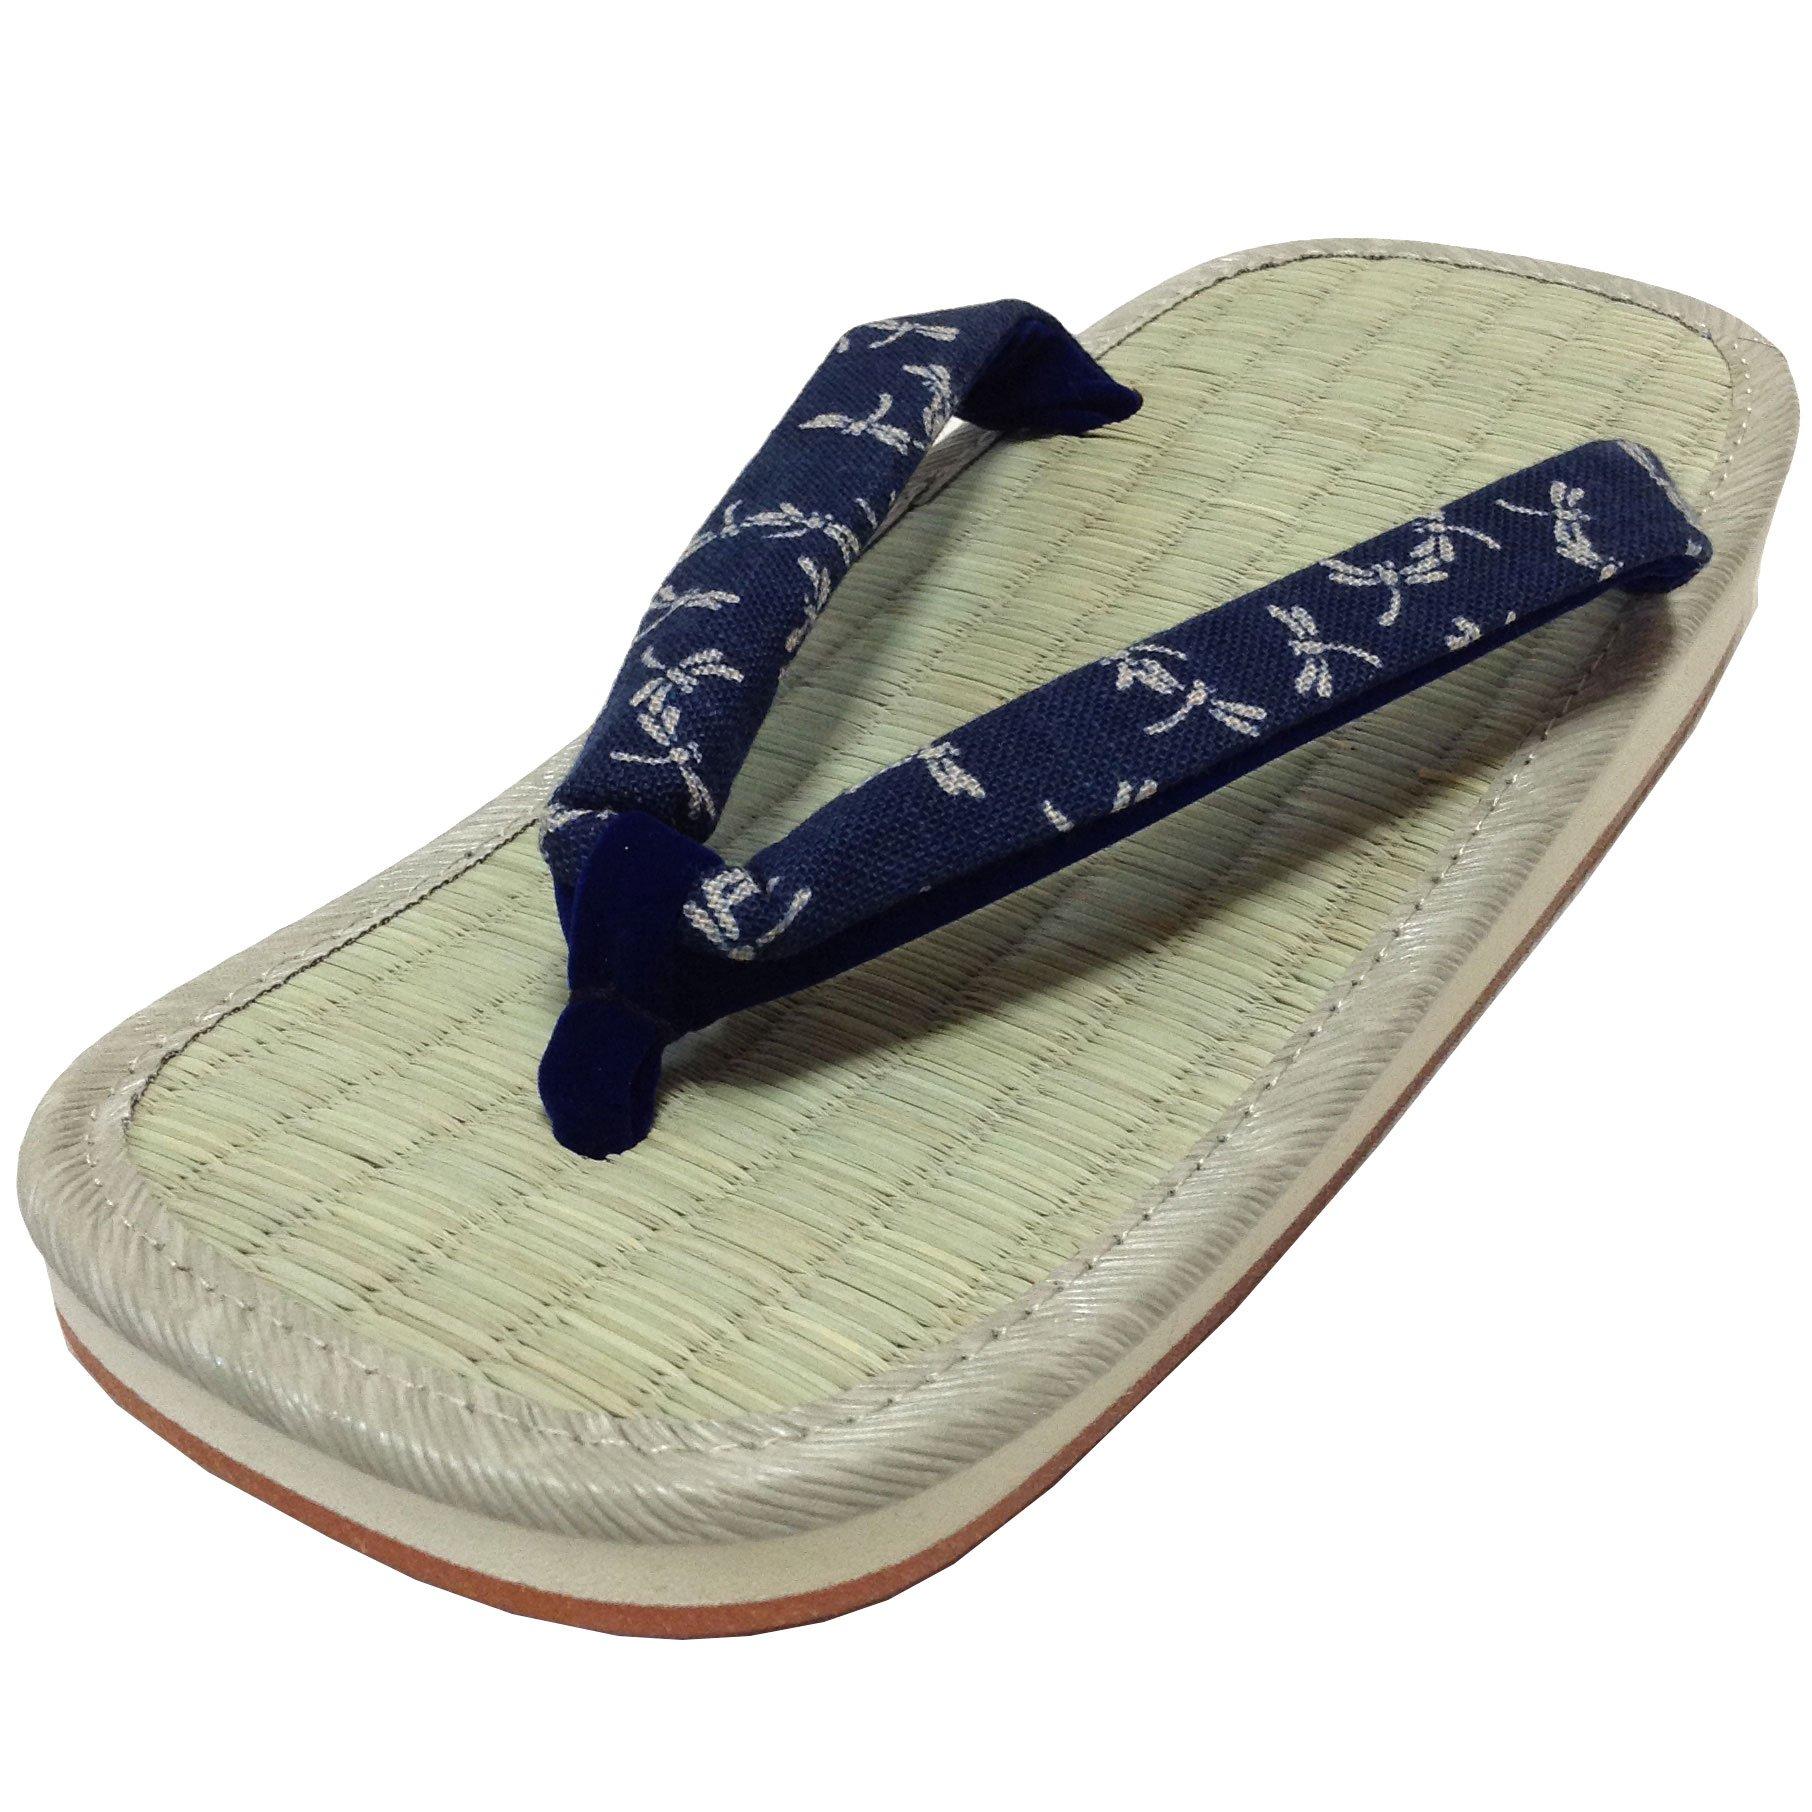 Edoten Made in Japan Setta Sandals.Rush Grass Amezoko Rubber Sole. Small Dragonfly 07. SizeXL